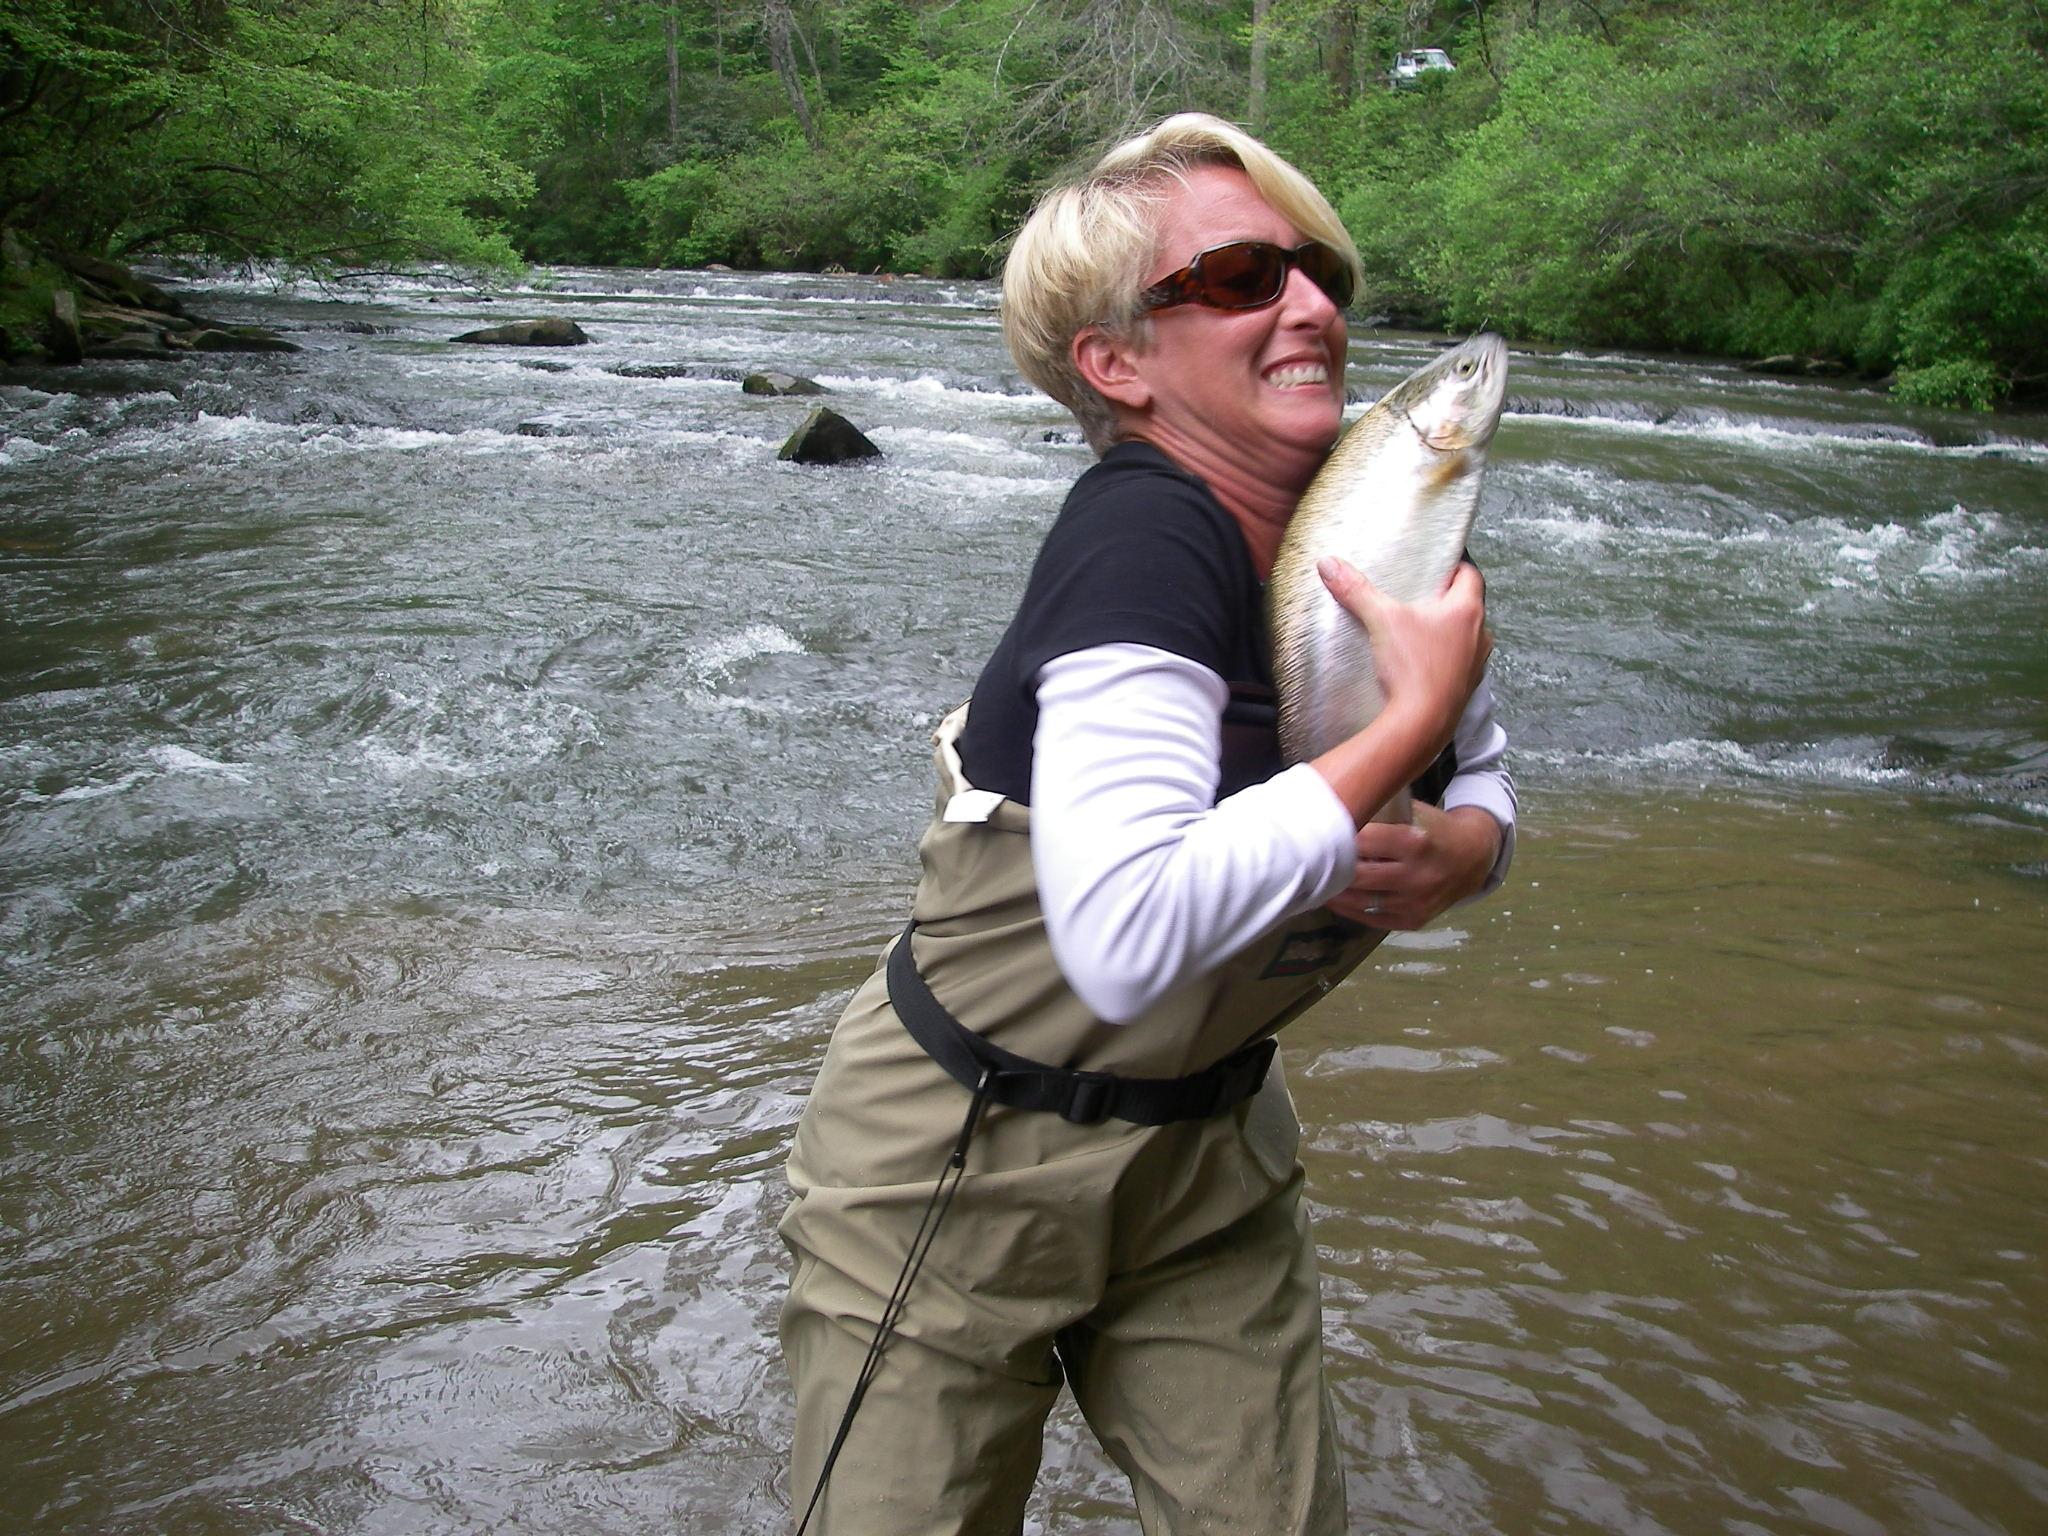 North Georgia Wade Fishing Trips | Reel'em In Guide Service